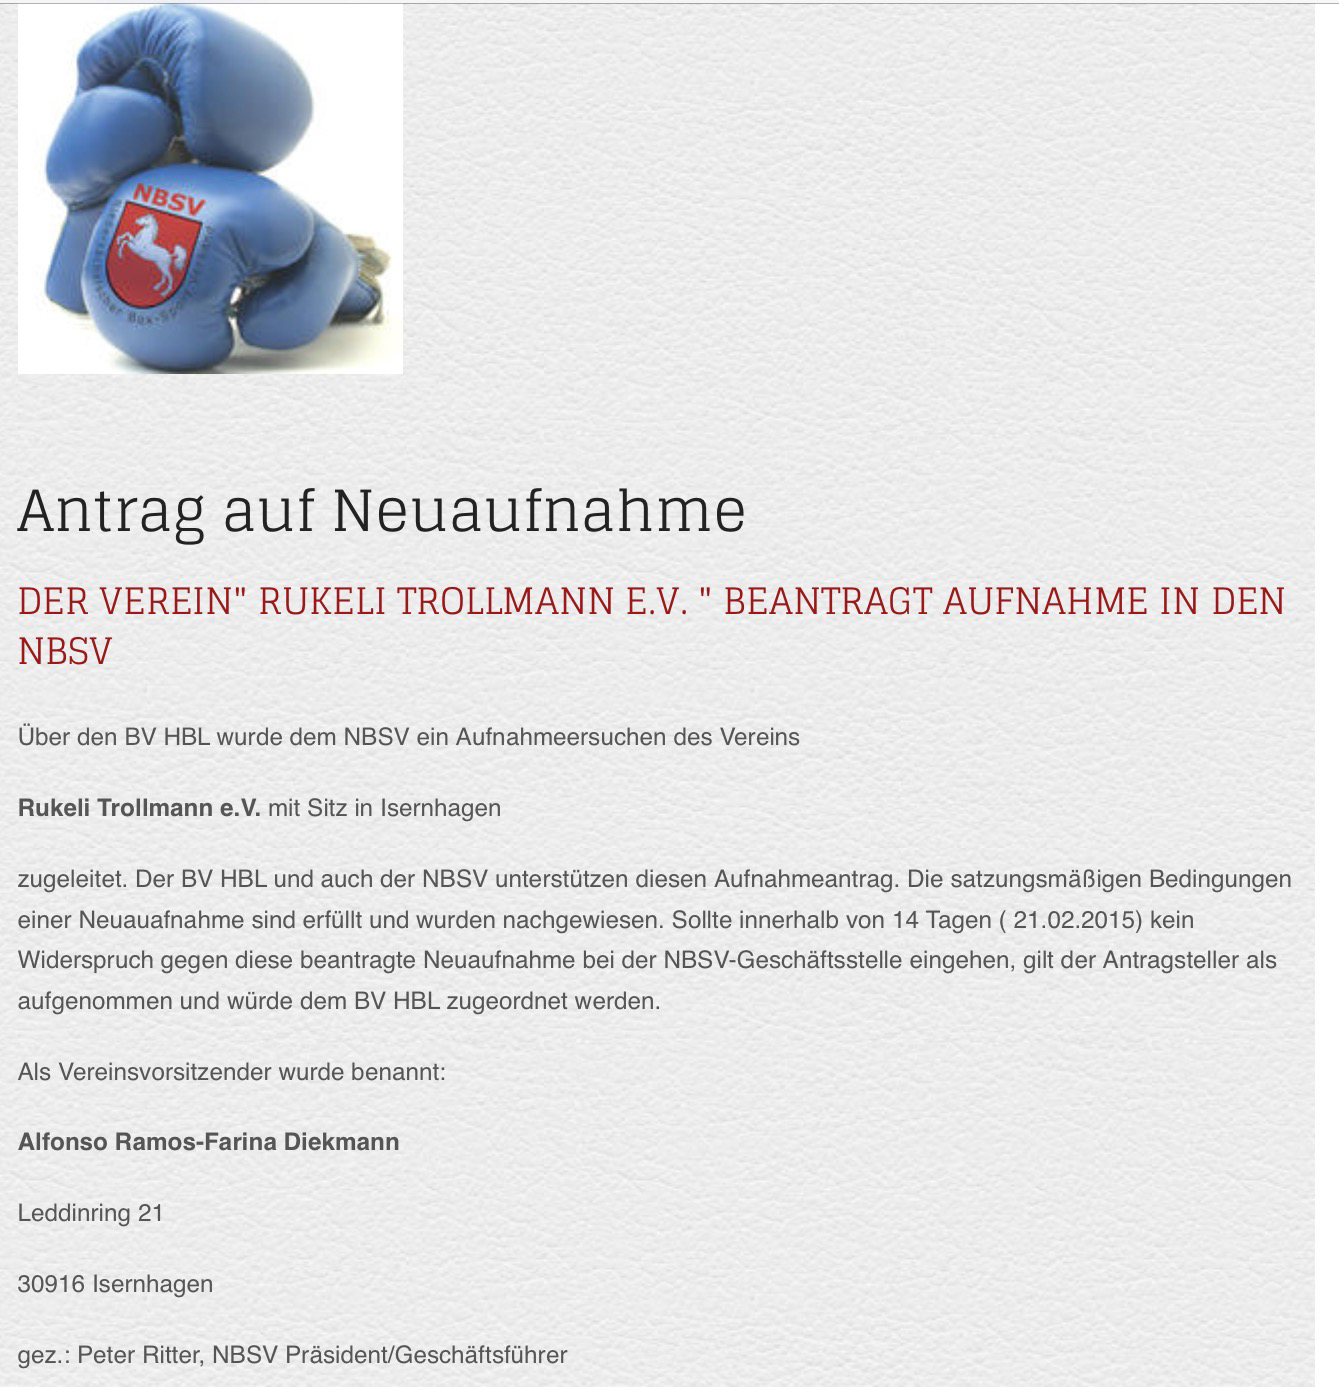 antrag-neuaufnahme-trollmann-ev